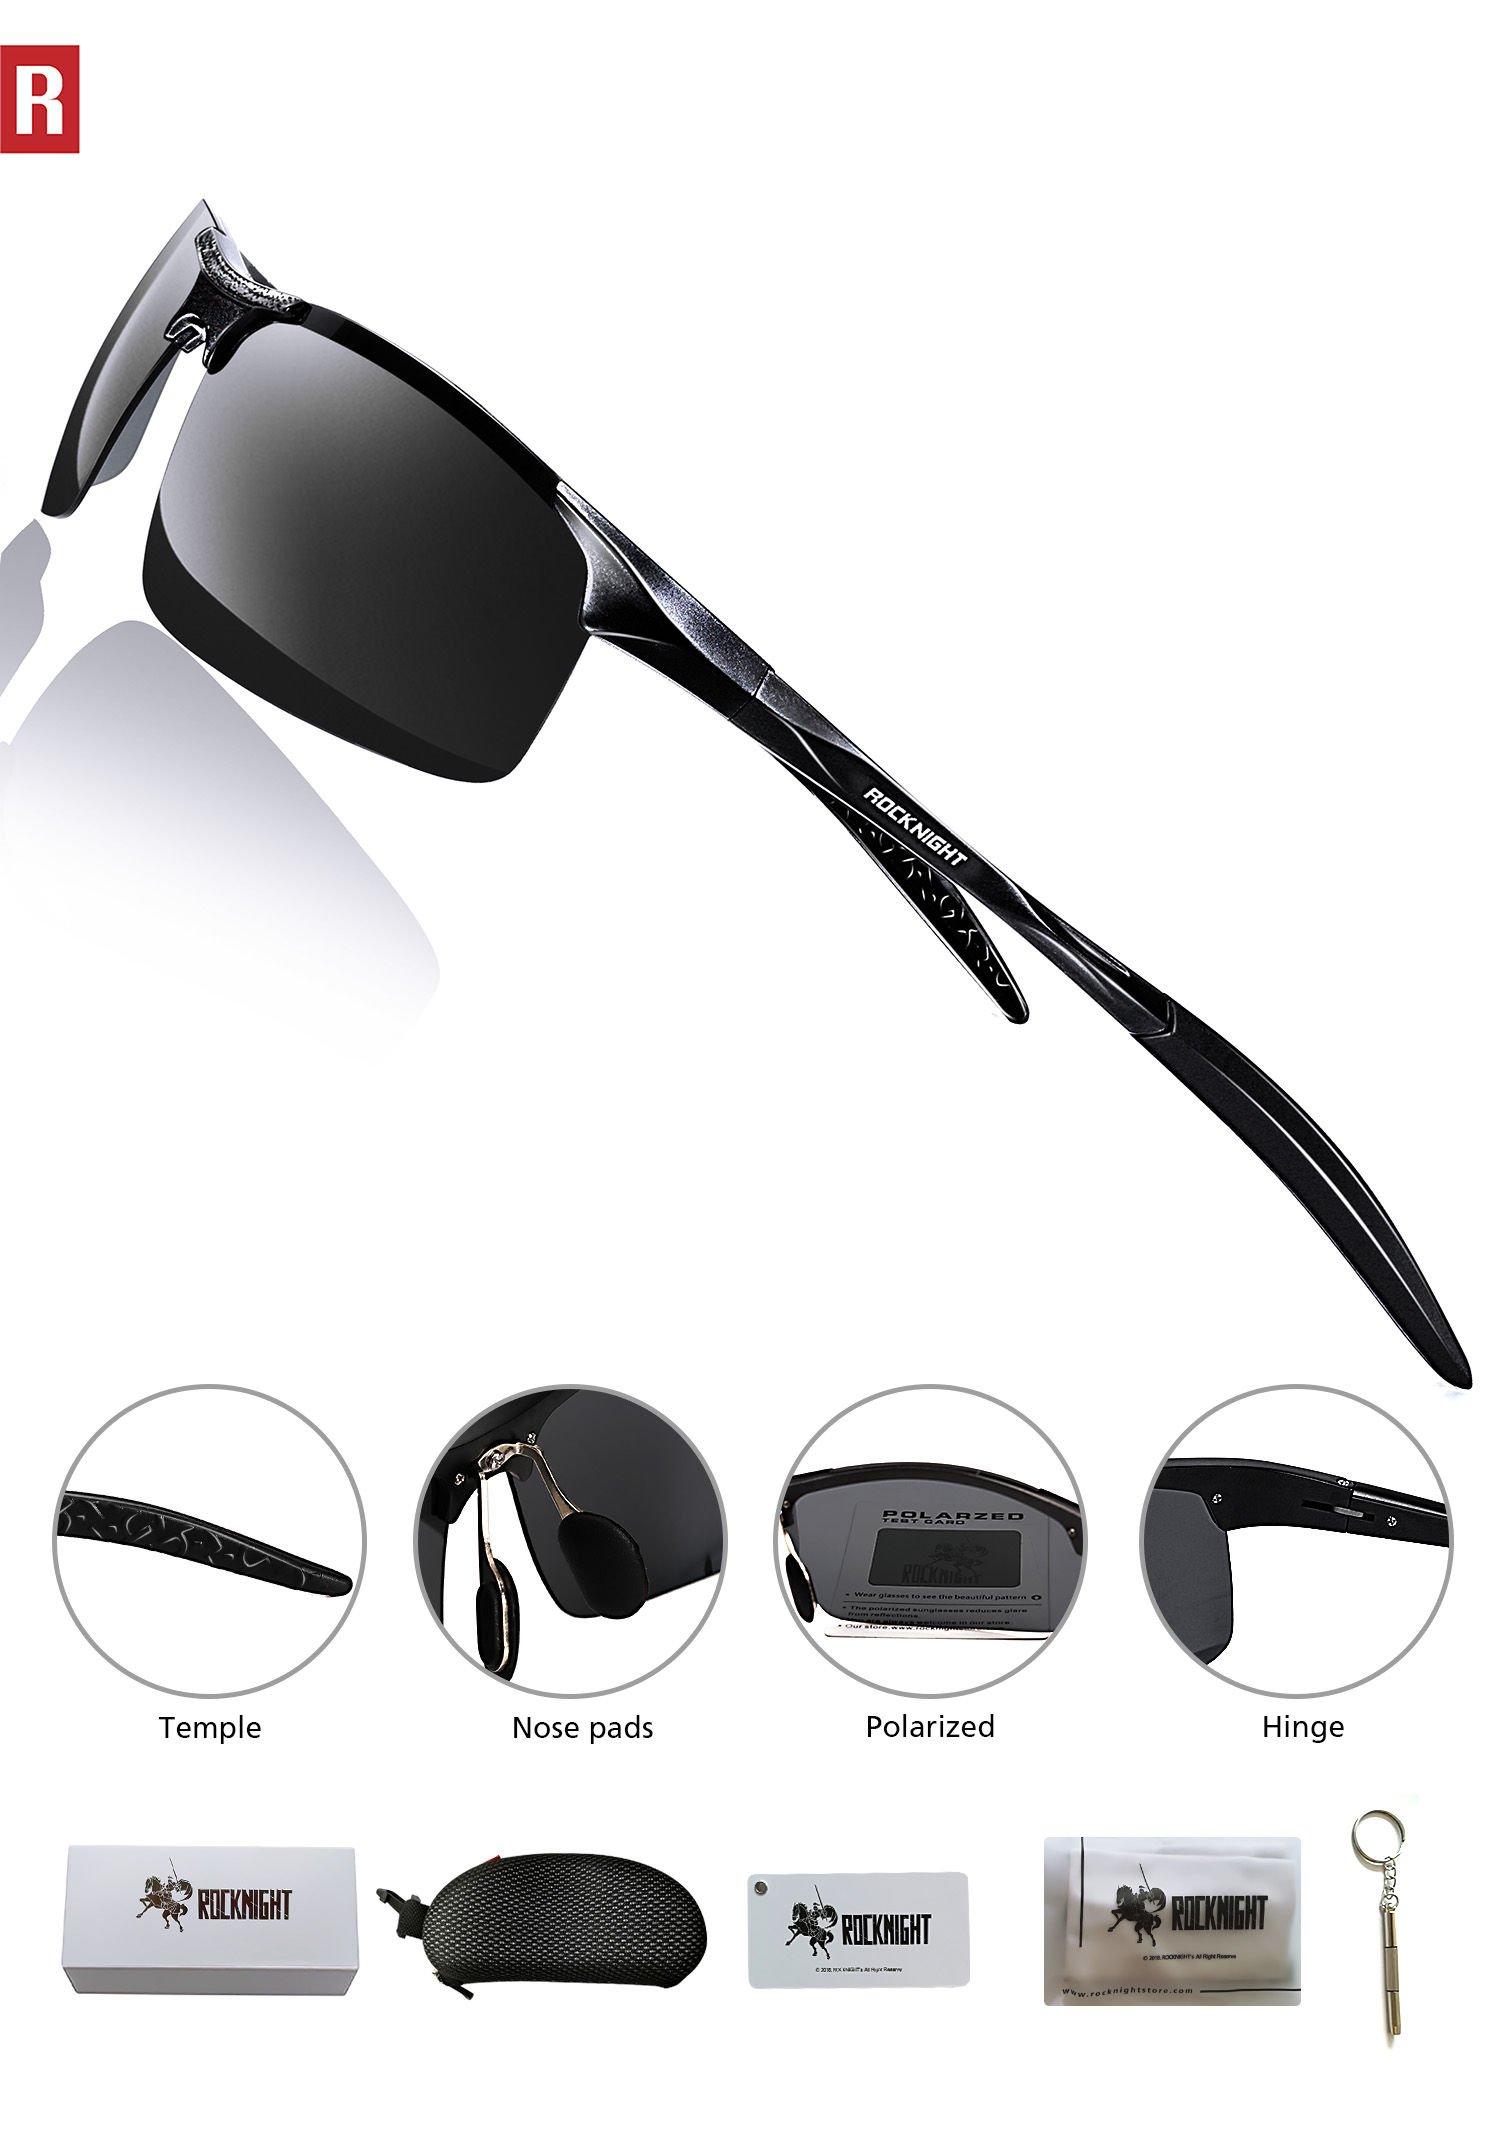 d55cc20890e ROCKNIGHT Driving Polarized Sunglasses for Men UV Protection HD Glasses  Ultra Lightweight Al-Mg Metal Outdoor Golf Fishing Sports Sunglasses  Rimless - A8177 ...